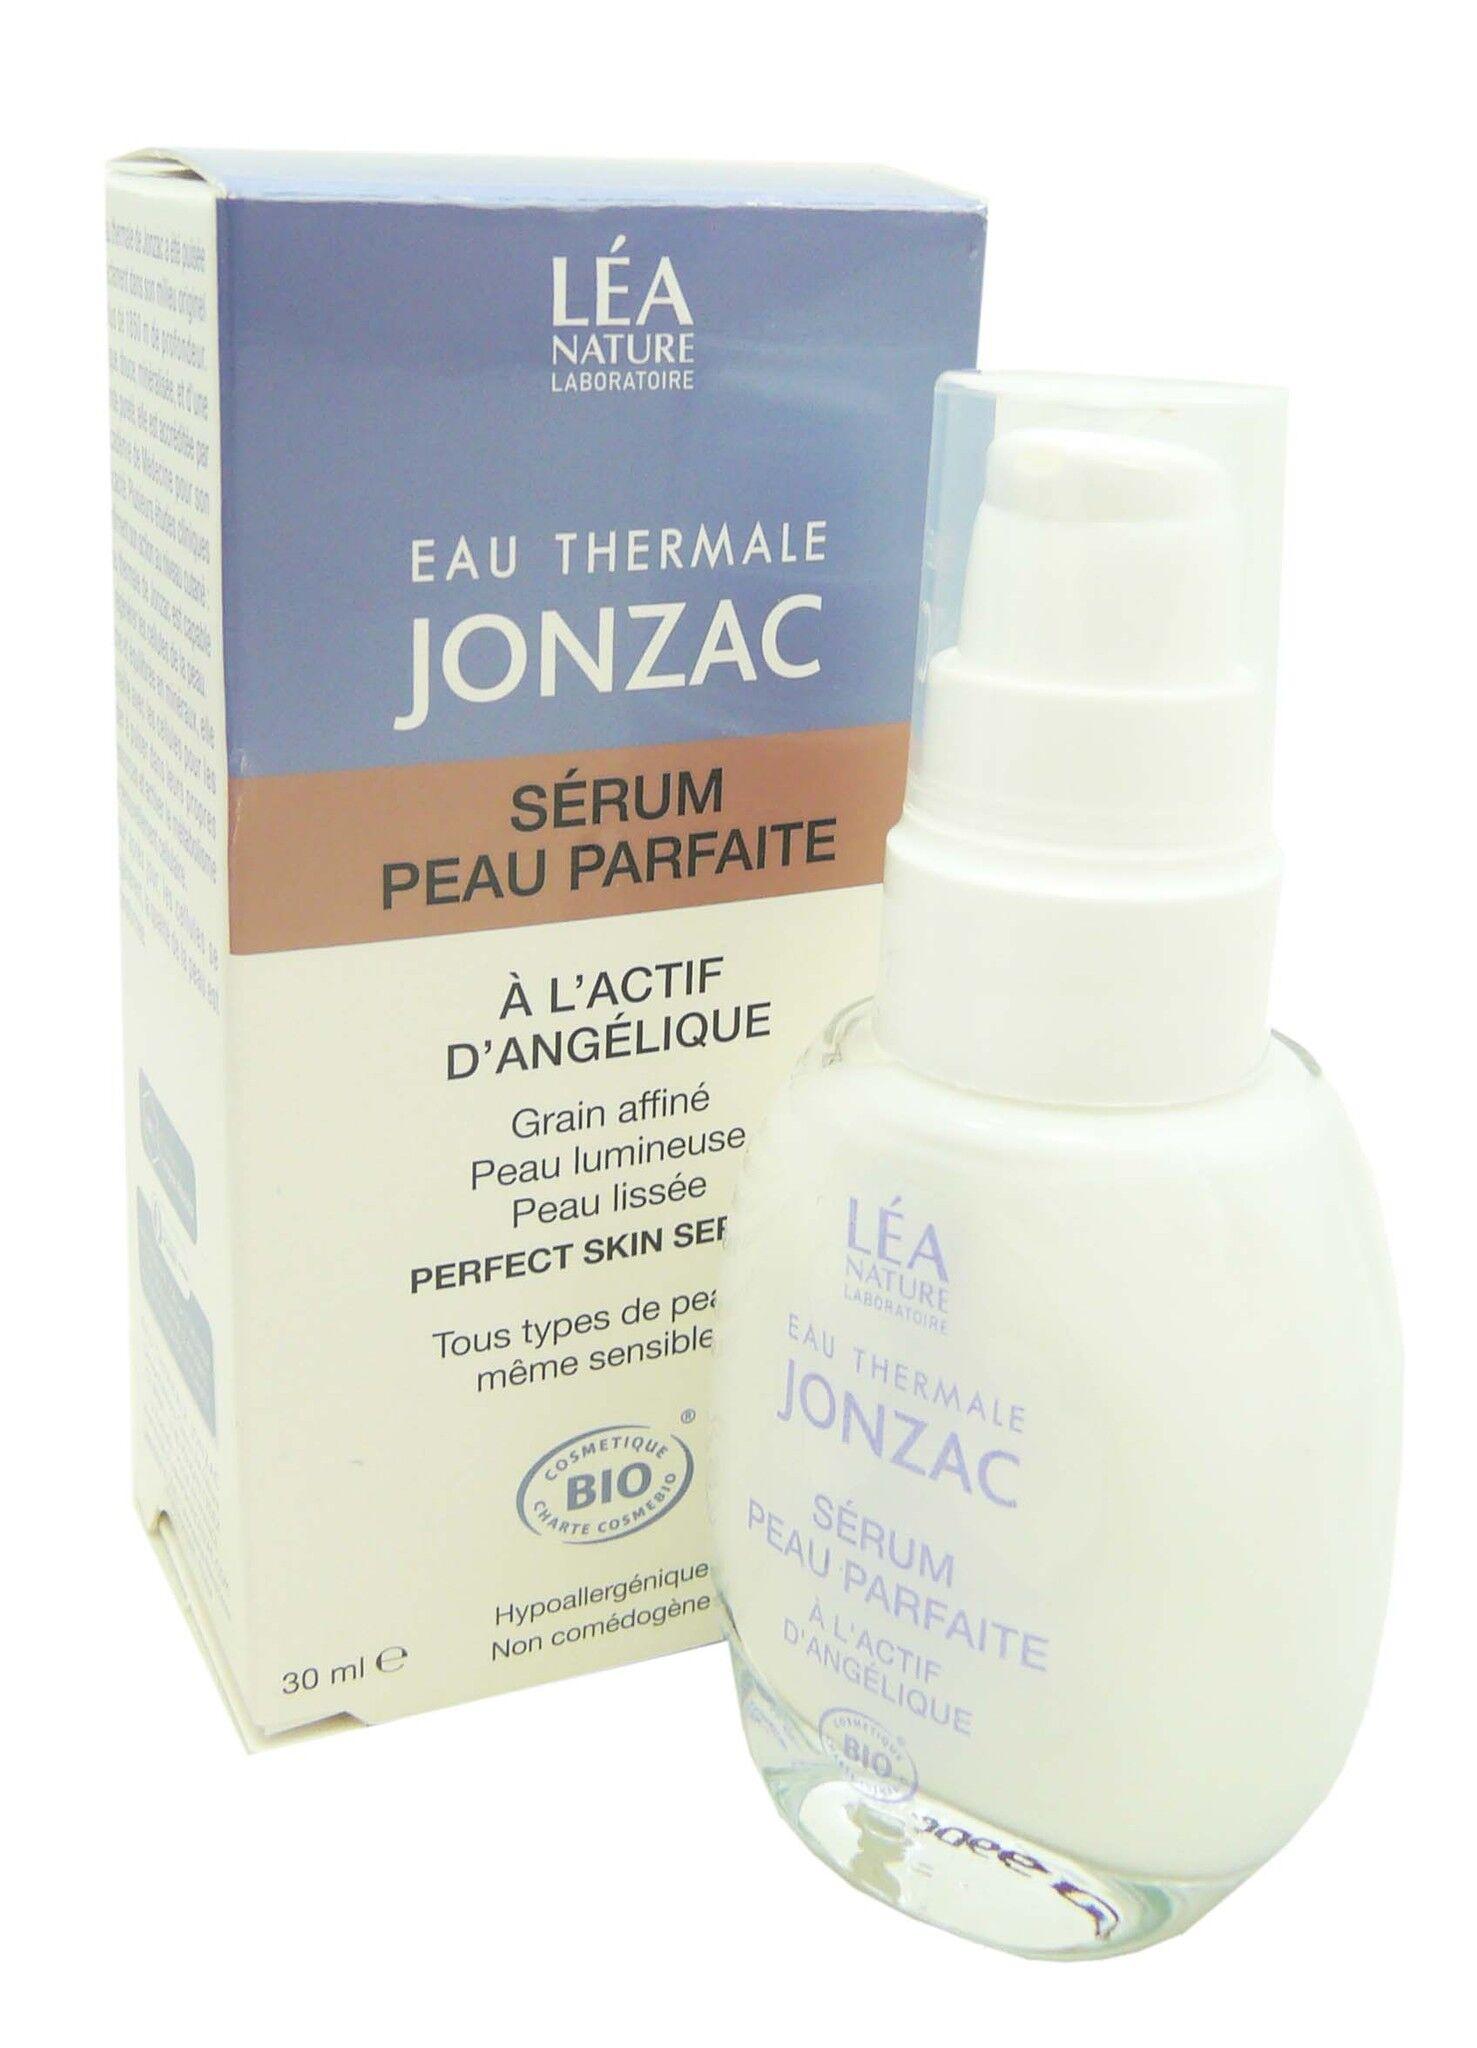 Jonzac serum peau parfaite 30ml